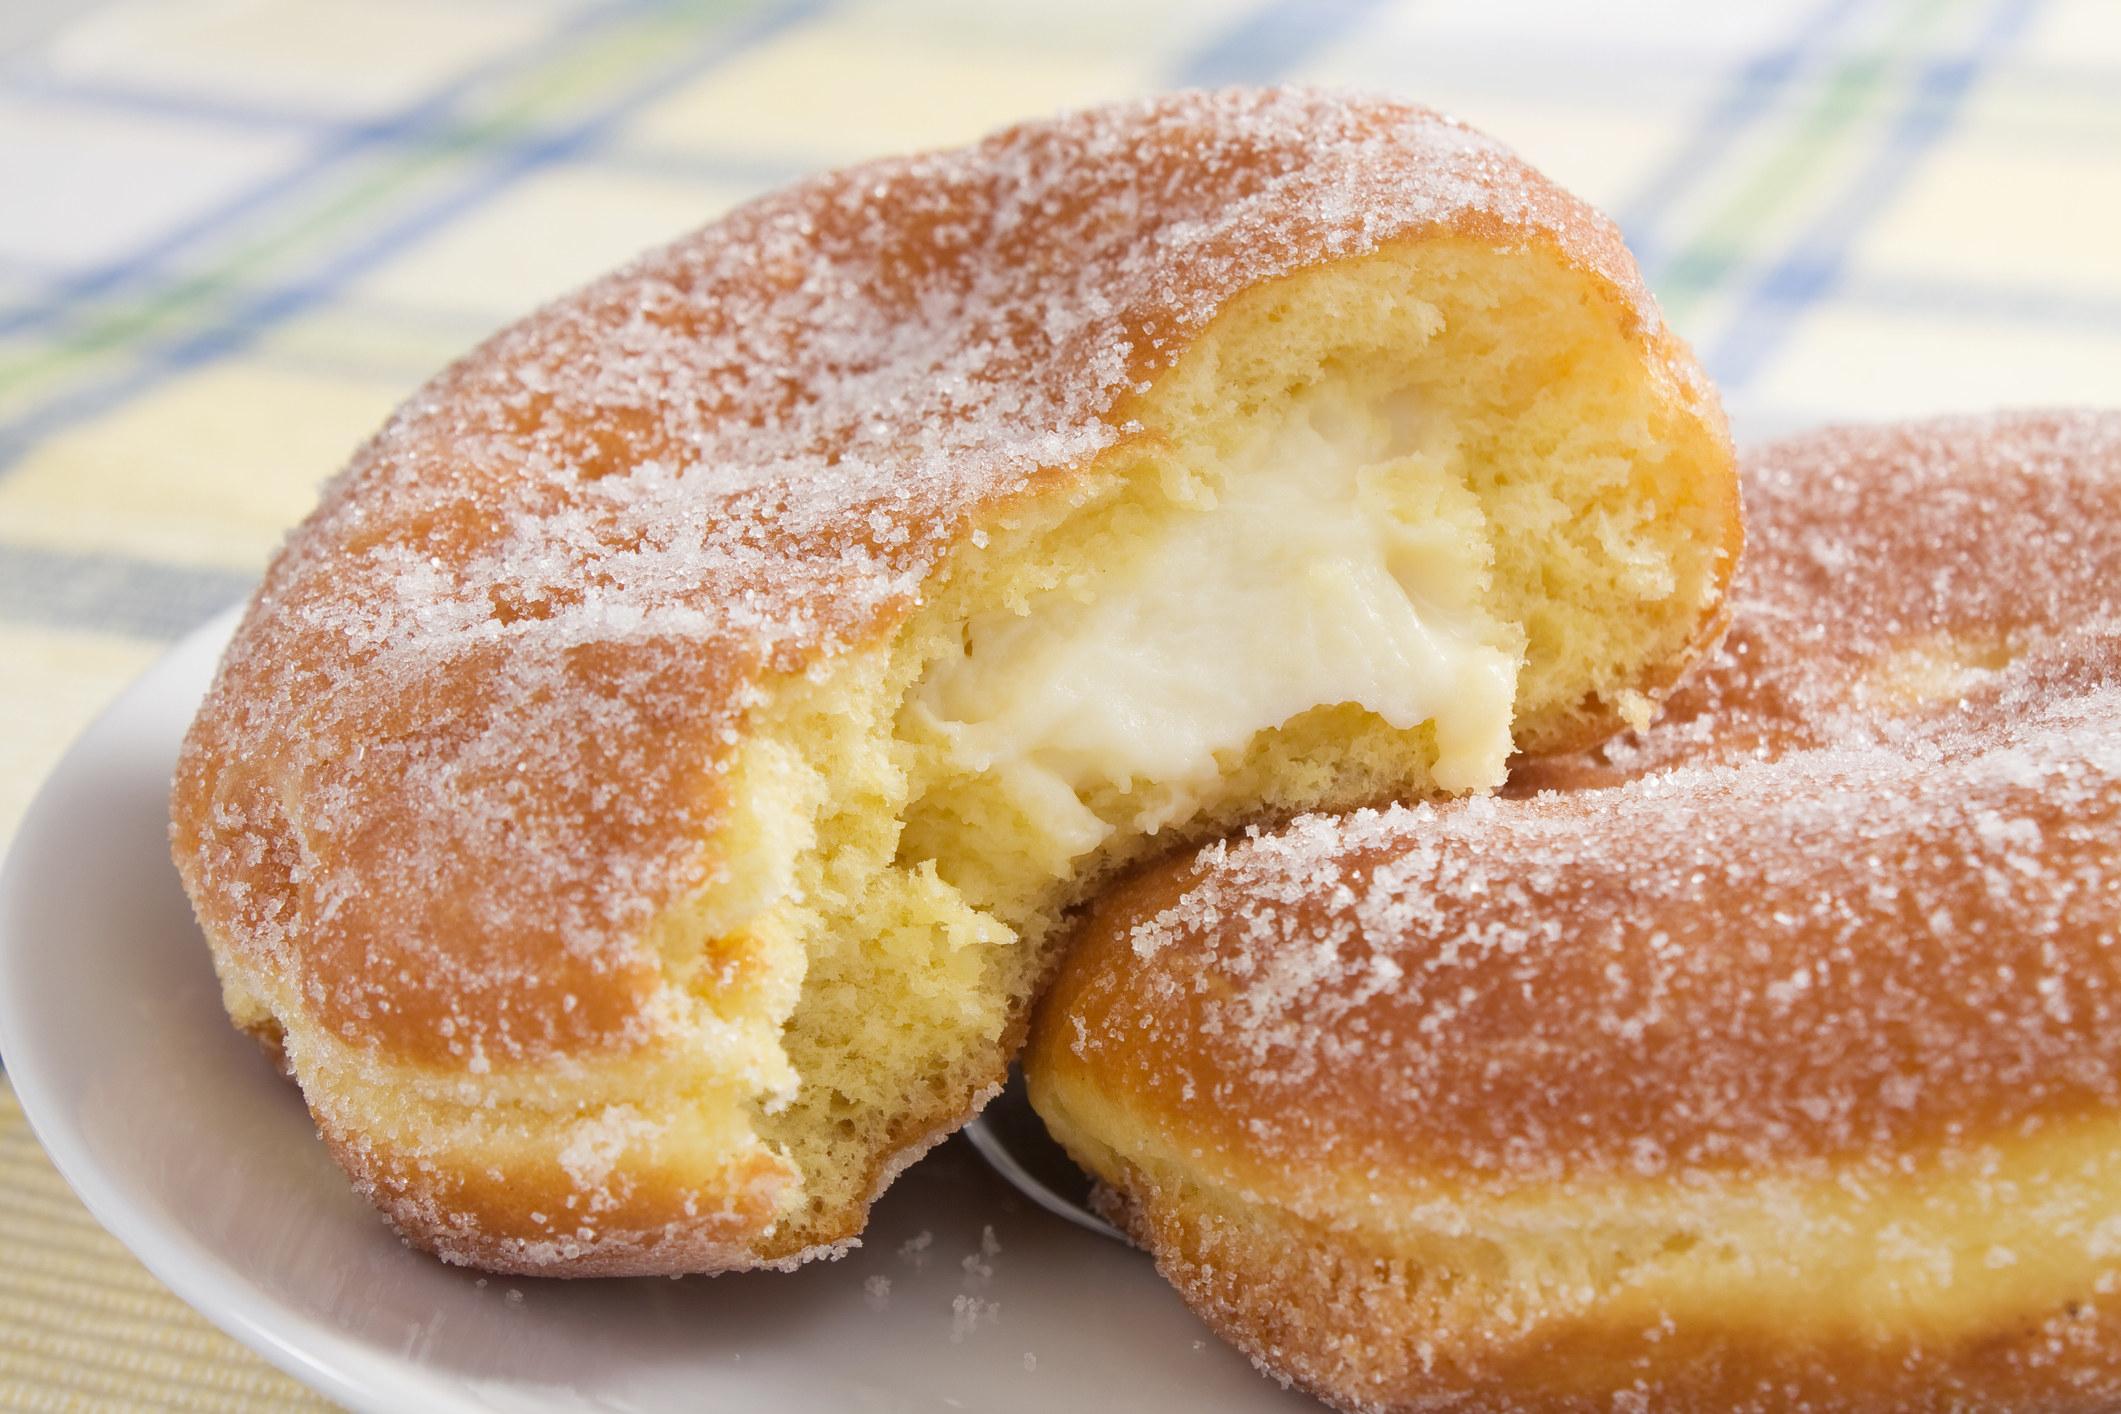 Paczki stuffed with cream.